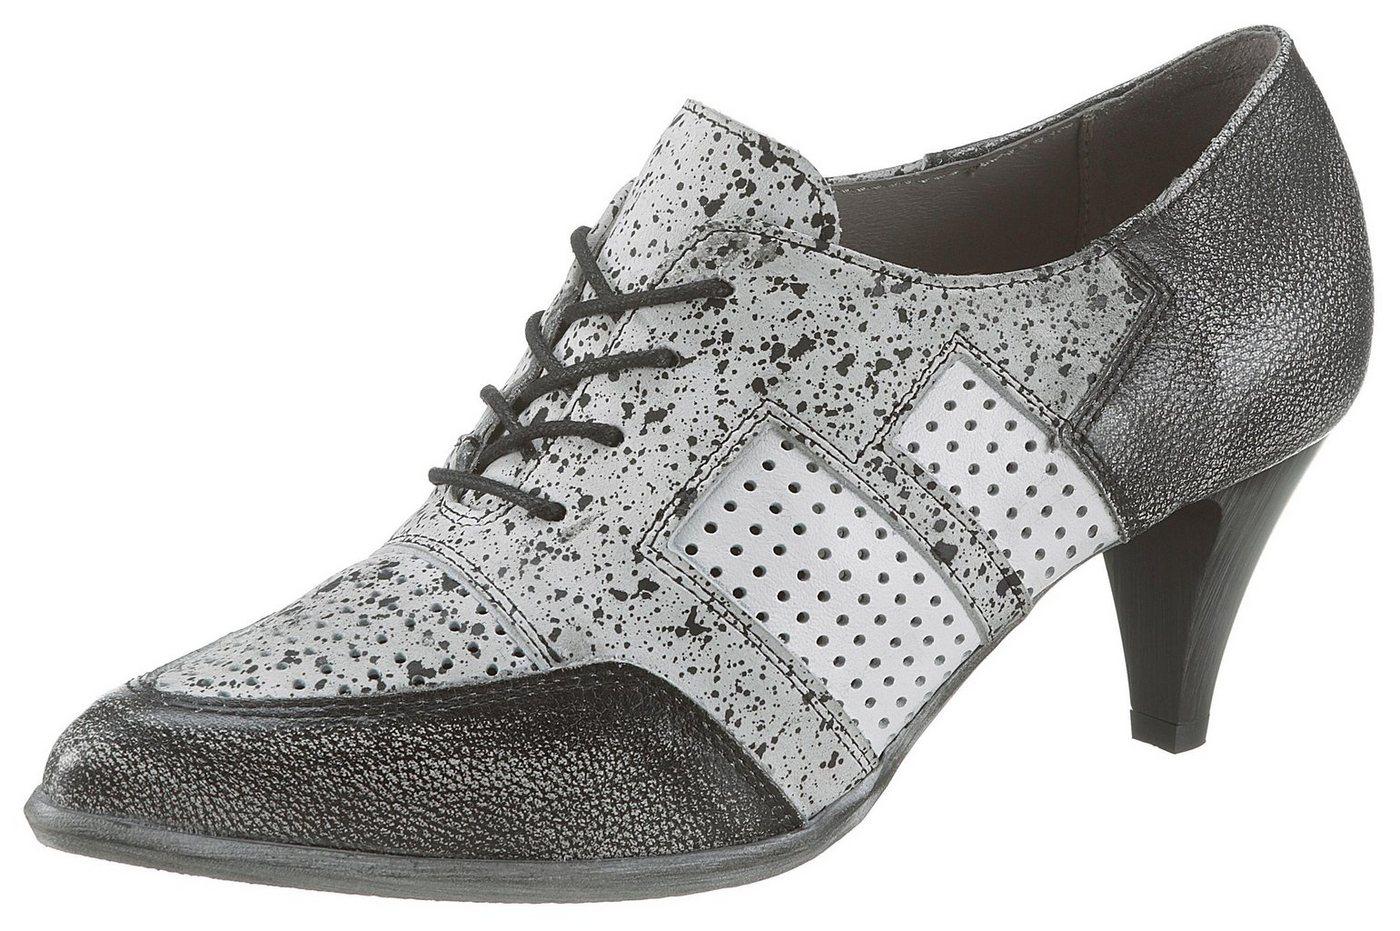 Simen Schnürpumps in eleganter, spitzer Form | Schuhe > Pumps > Schnürpumps | Grau | Simen